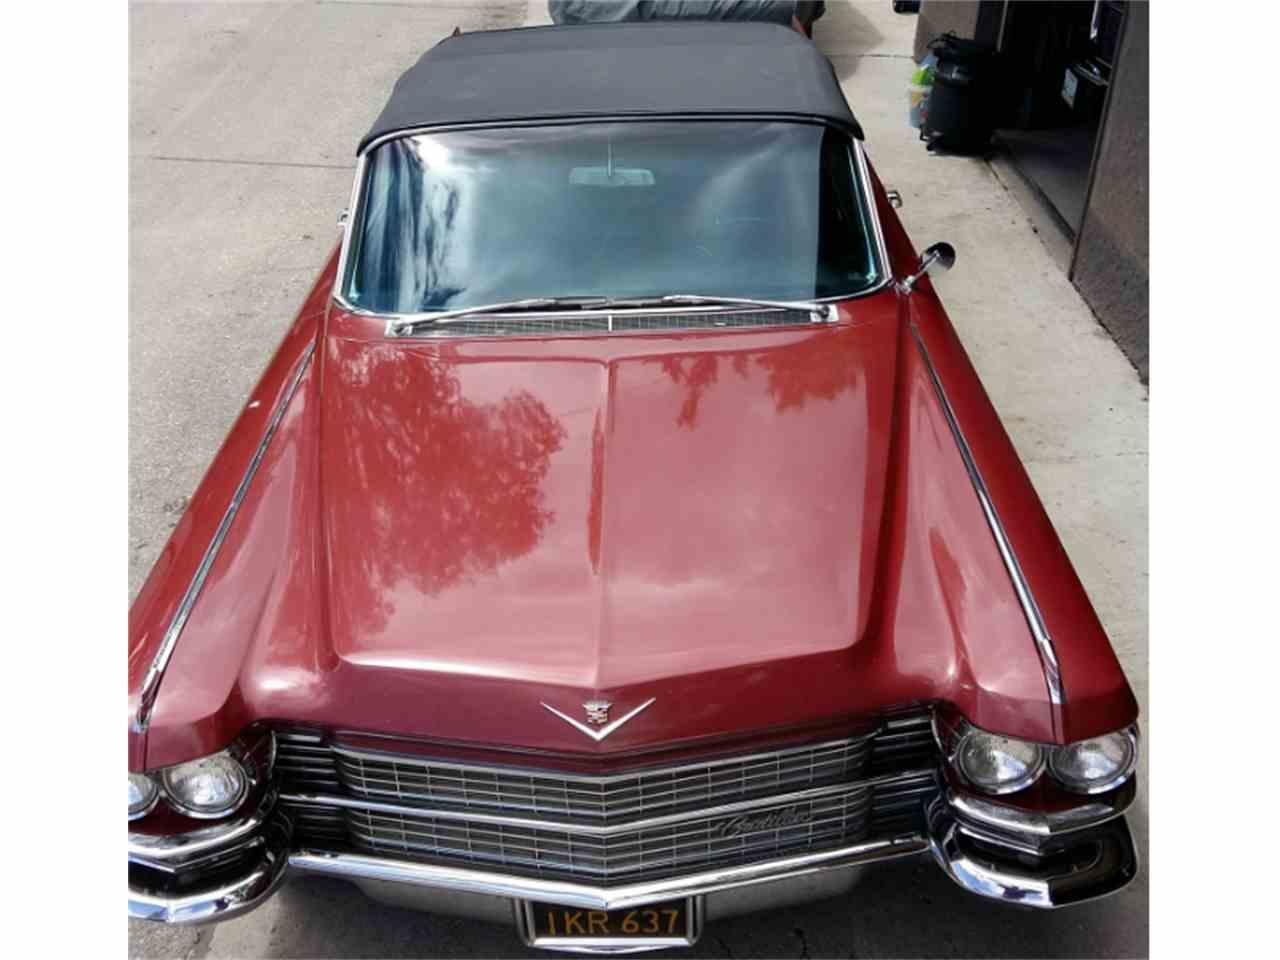 1963 Cadillac Coupe for Sale | ClassicCars.com | CC-994147